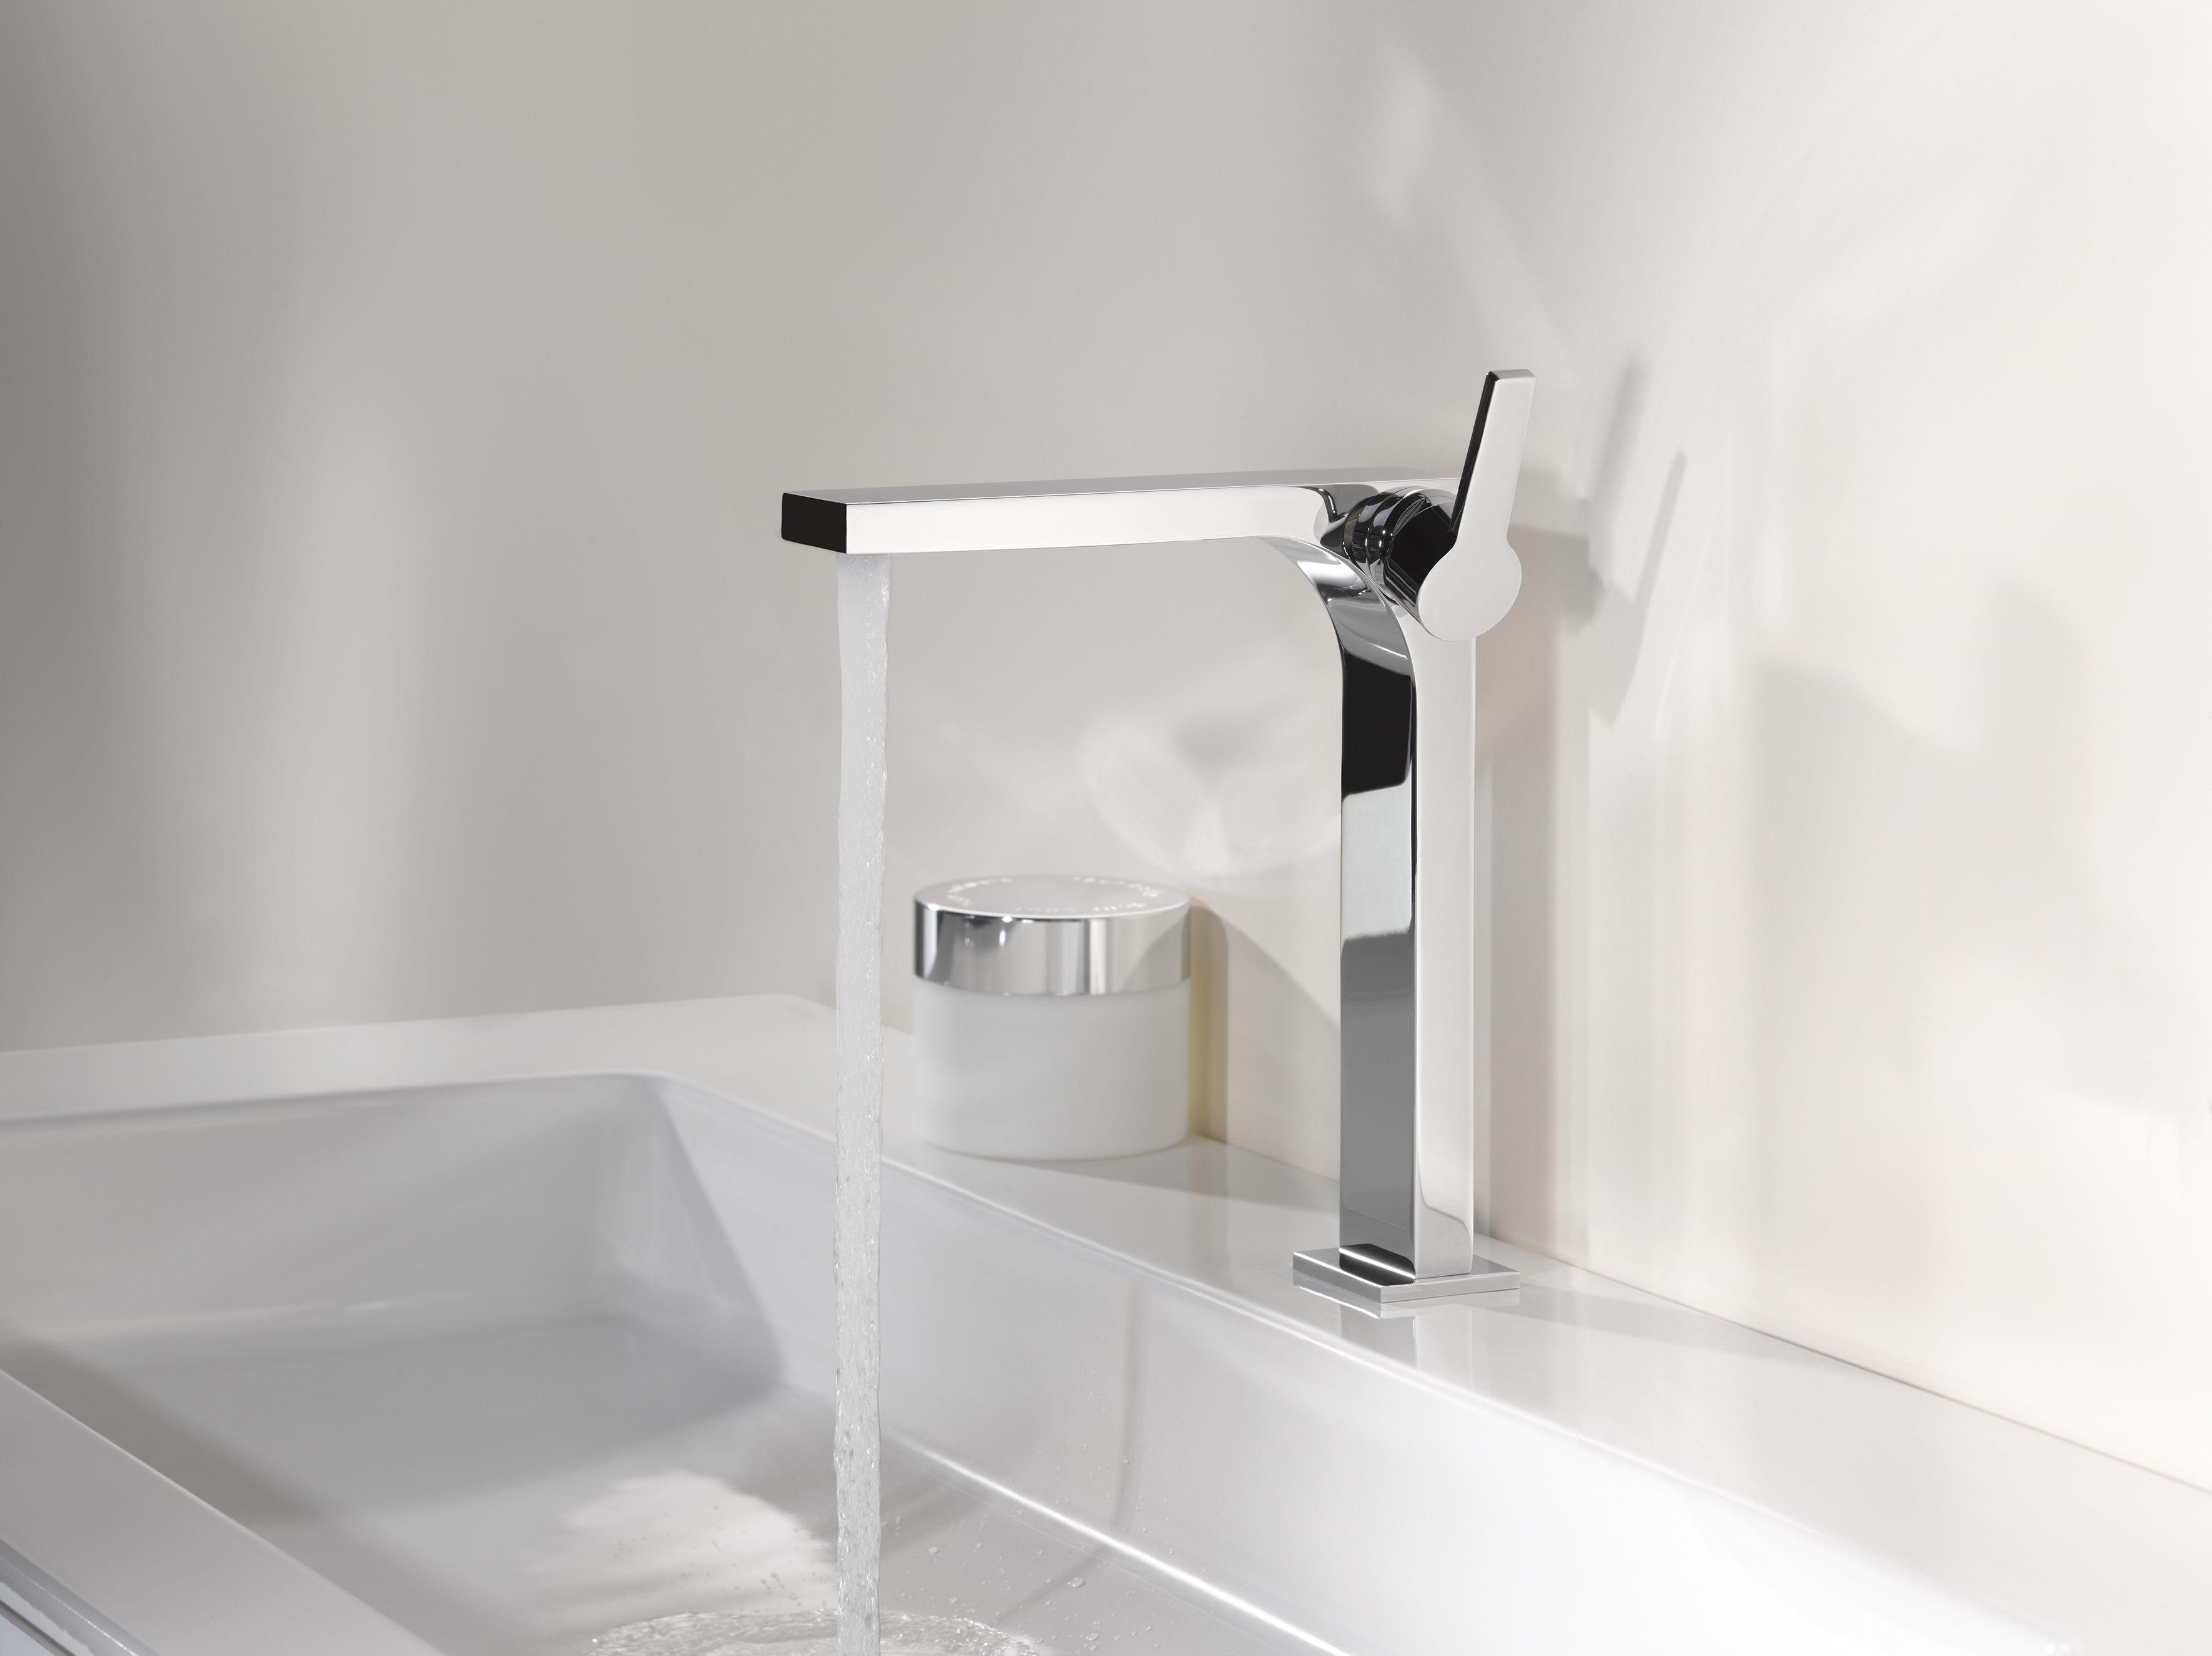 Keuco Edition 11 Armaturen Fittings Bathroomfurniture